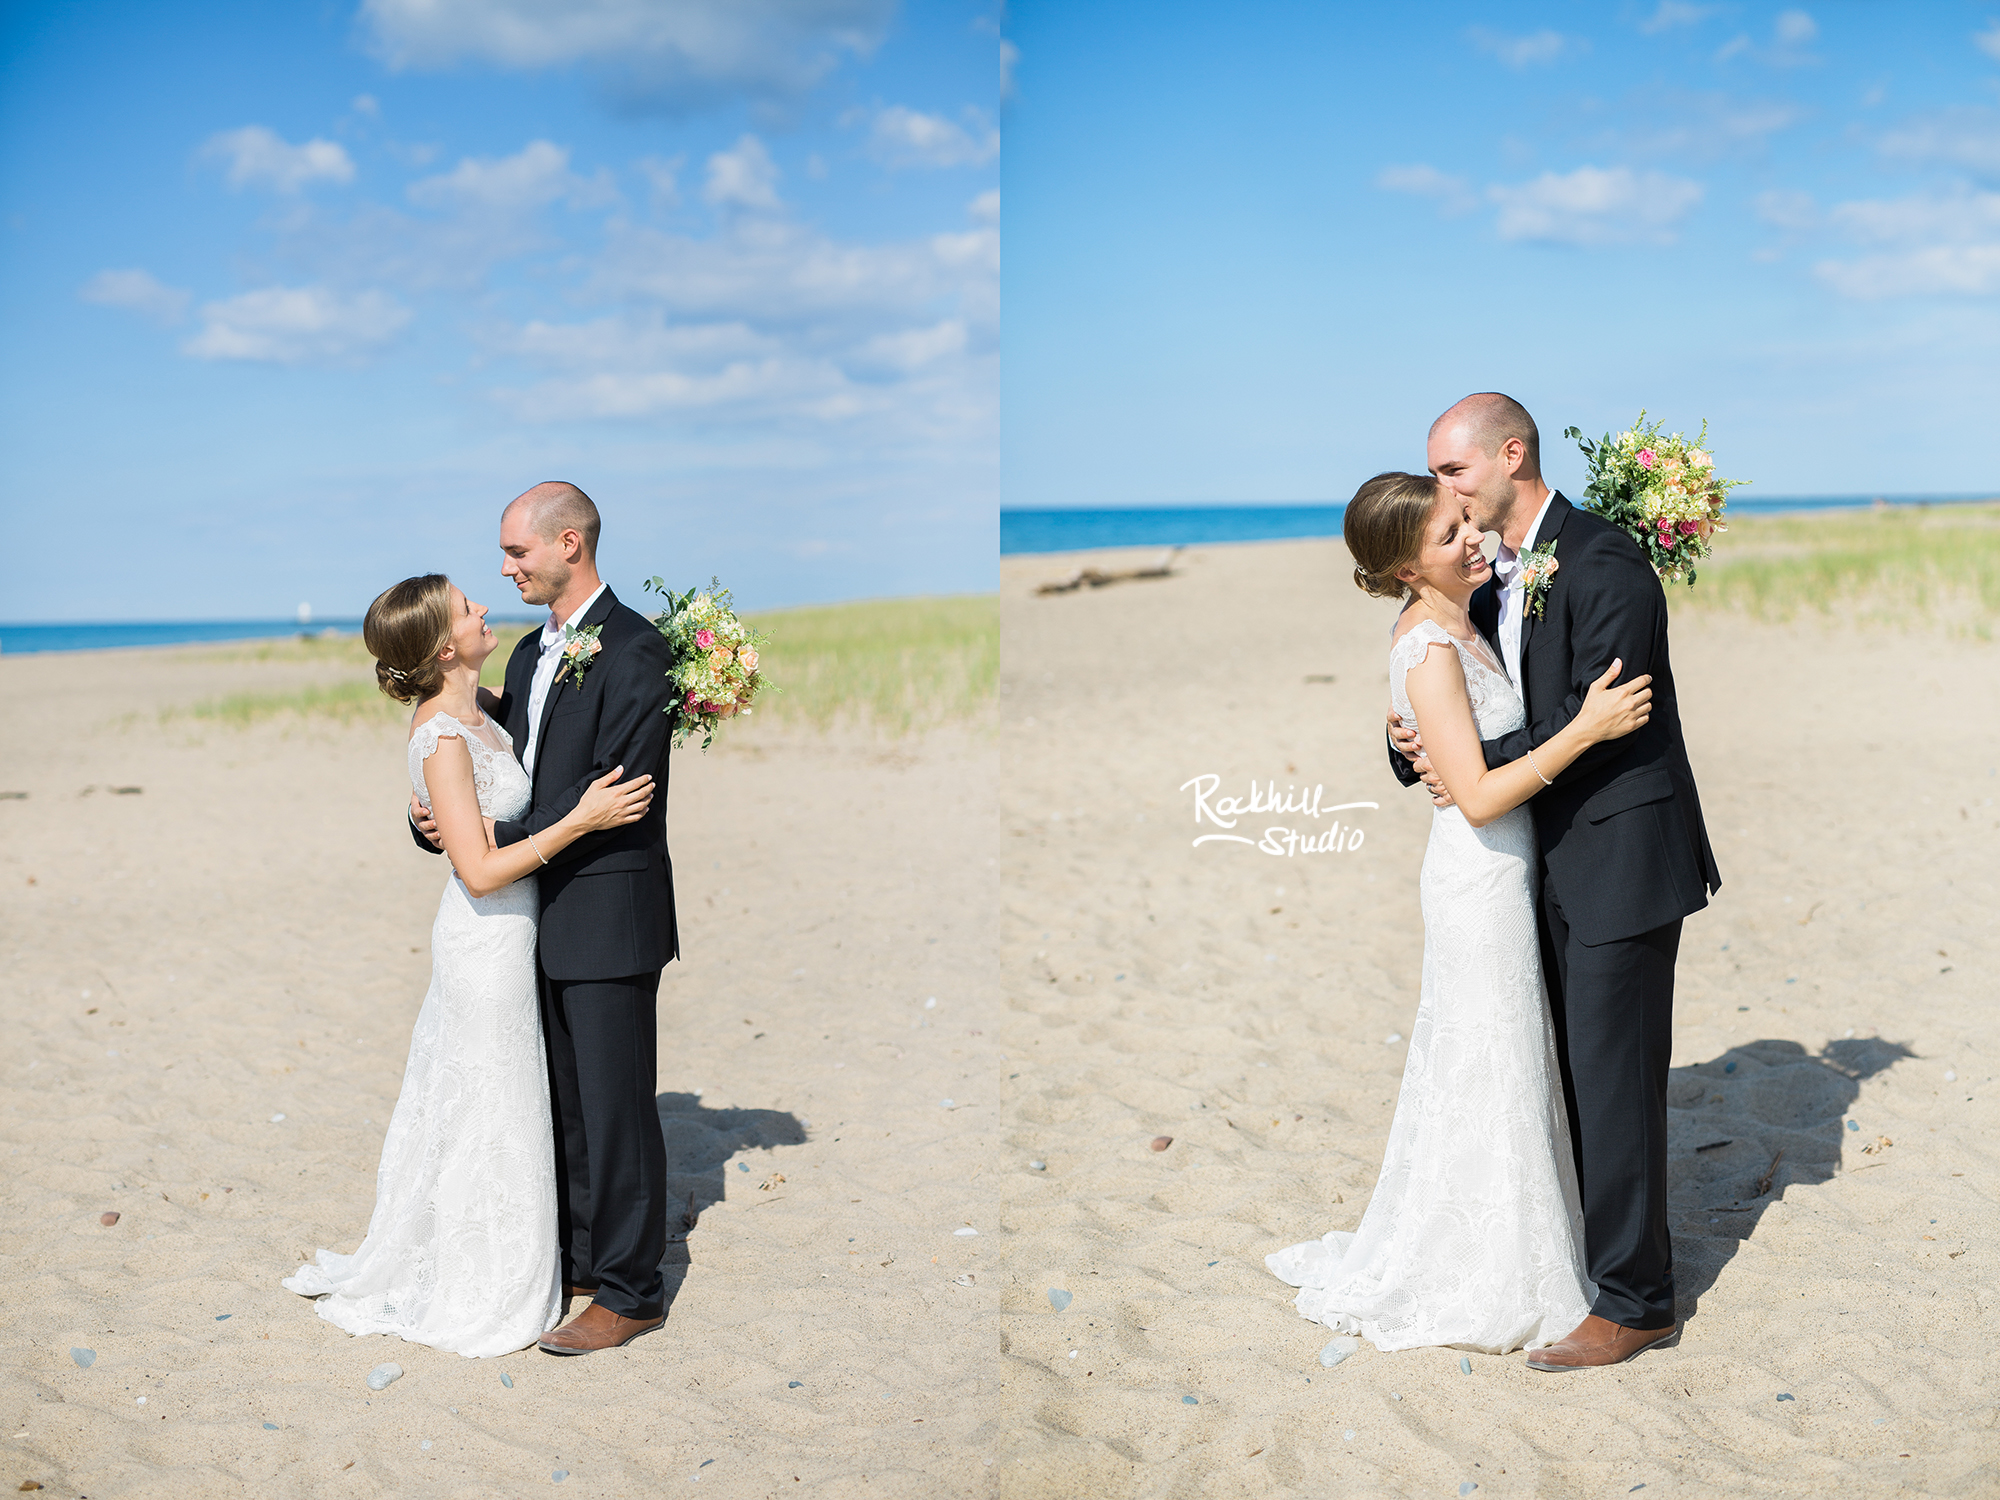 grand-marais-wedding-photography-upper-peninsula-northern-michigan-rockhill-50.jpg